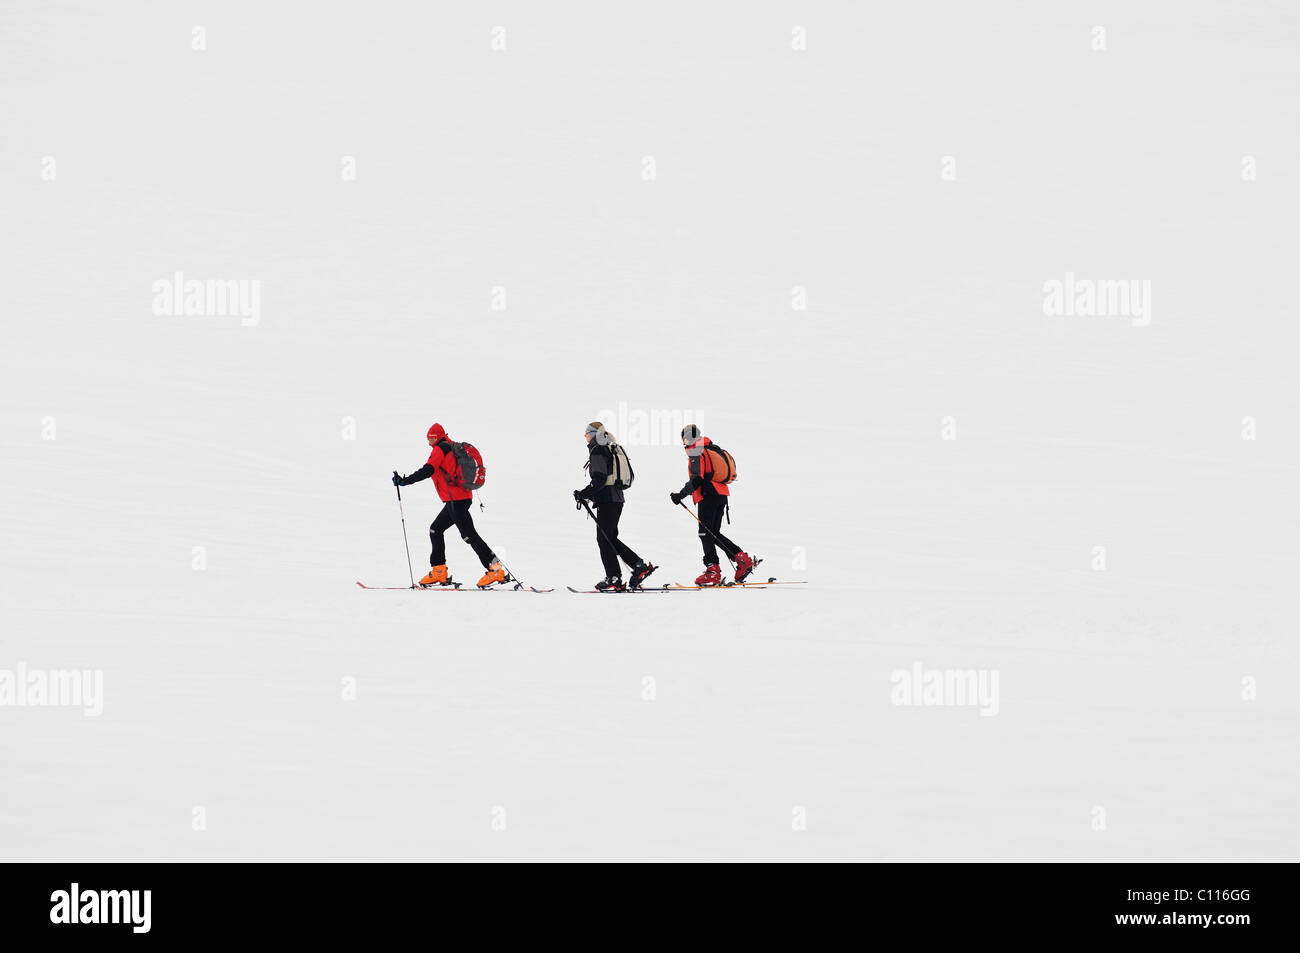 Three ski hikers - Stock Image